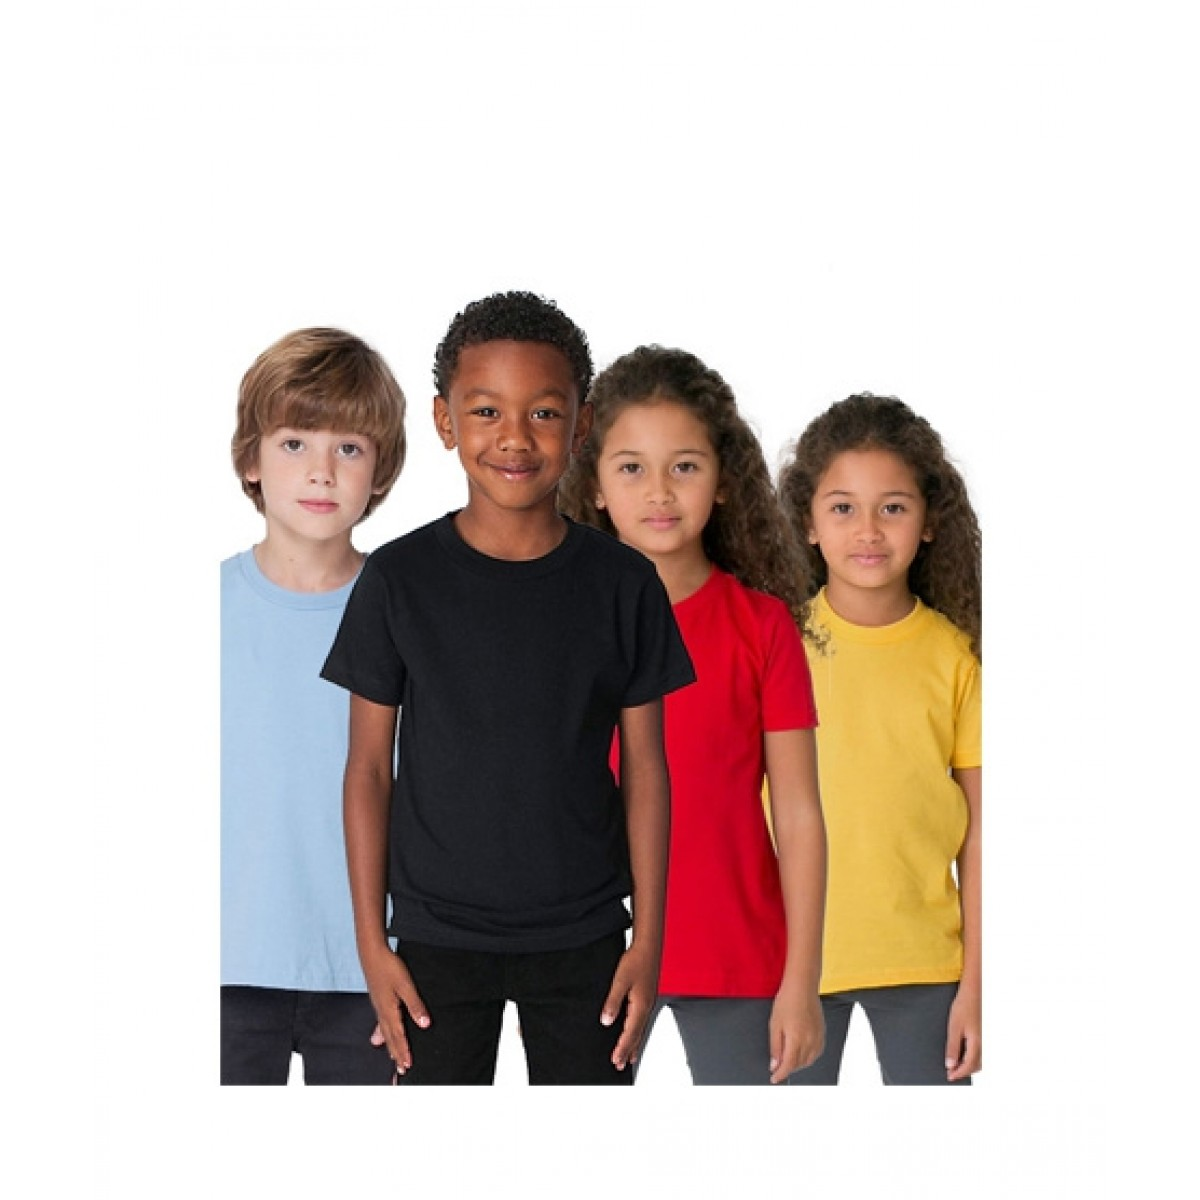 039a4643 C-Tees Pack Of 4 T-Shirt For Kids Price in Pakistan | Buy C-Tees Plain T- Shirt Multi (CKT10062) | iShopping.pk